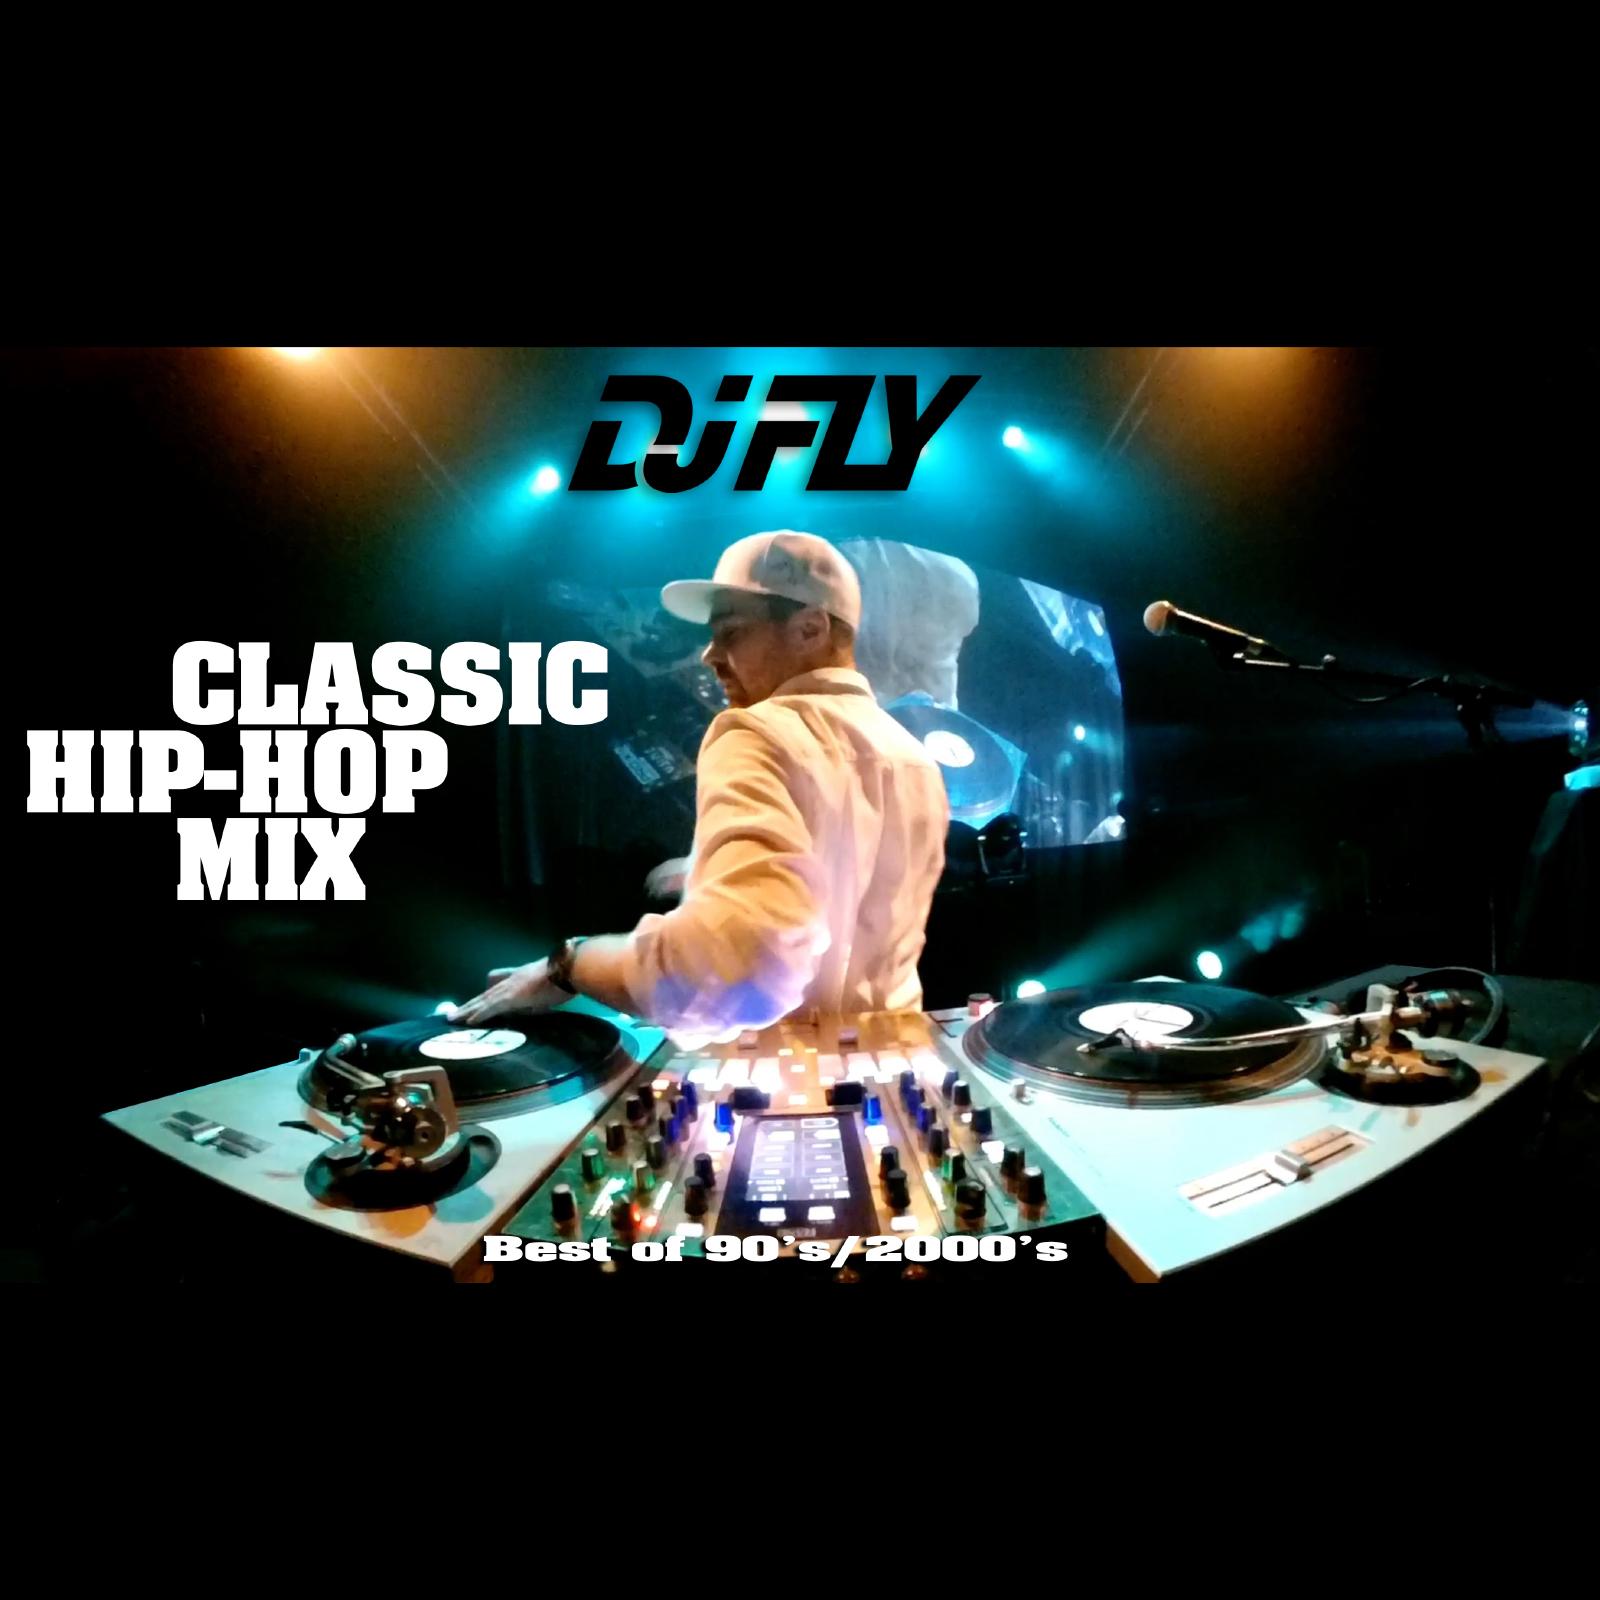 Dj Fly - Classic Hip Hop Mix